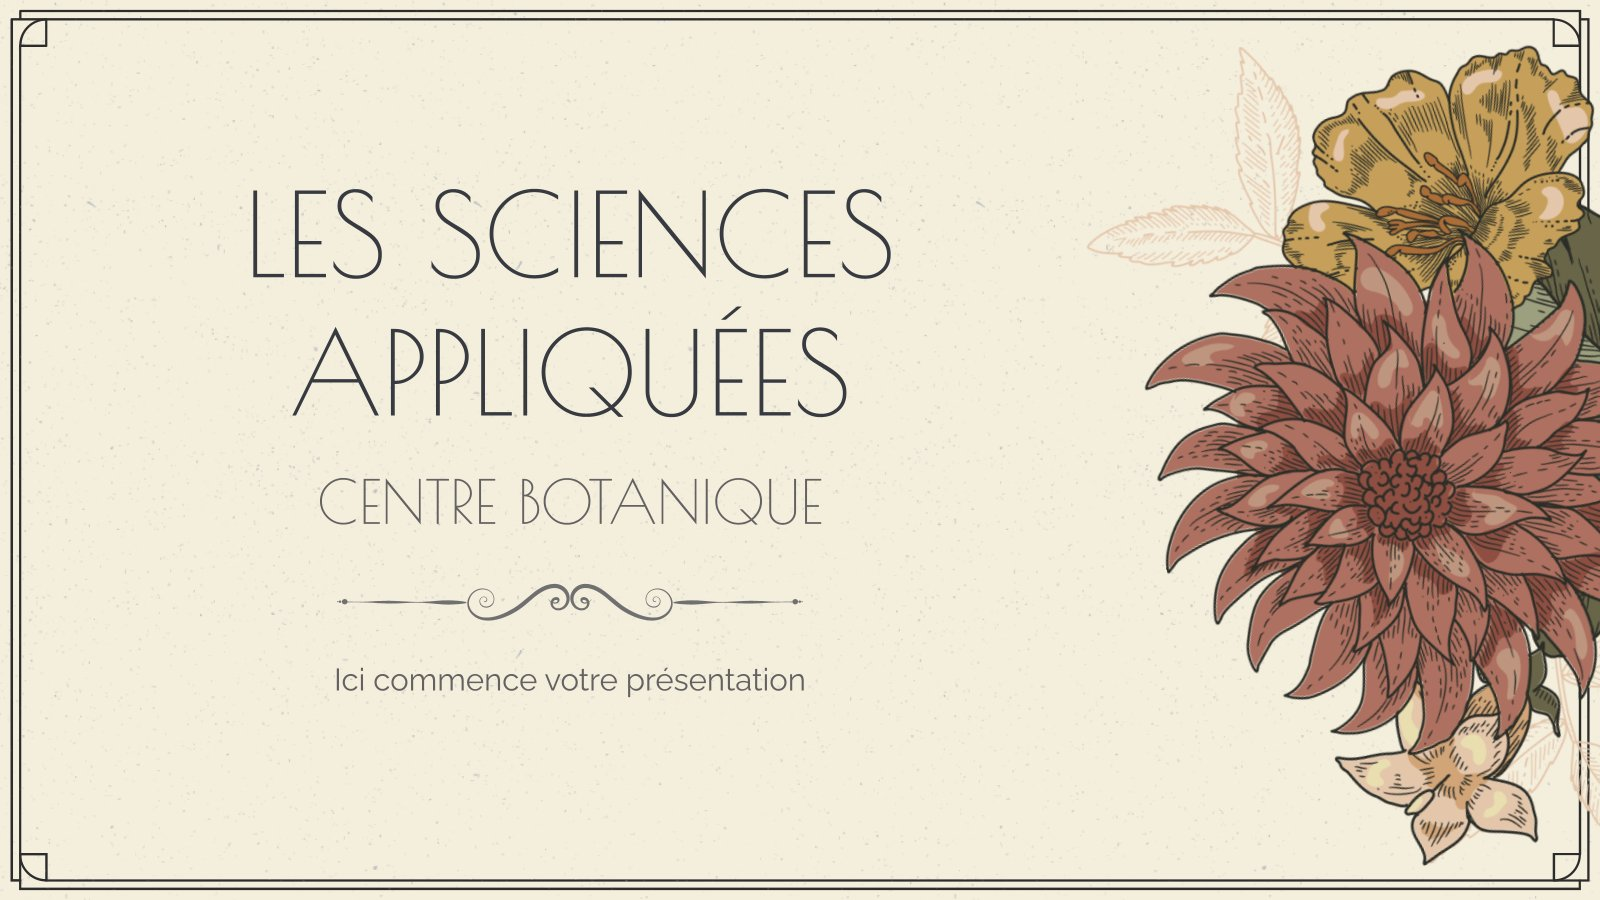 Plantilla de presentación Les Sciences Appliquées - Centre Botanique